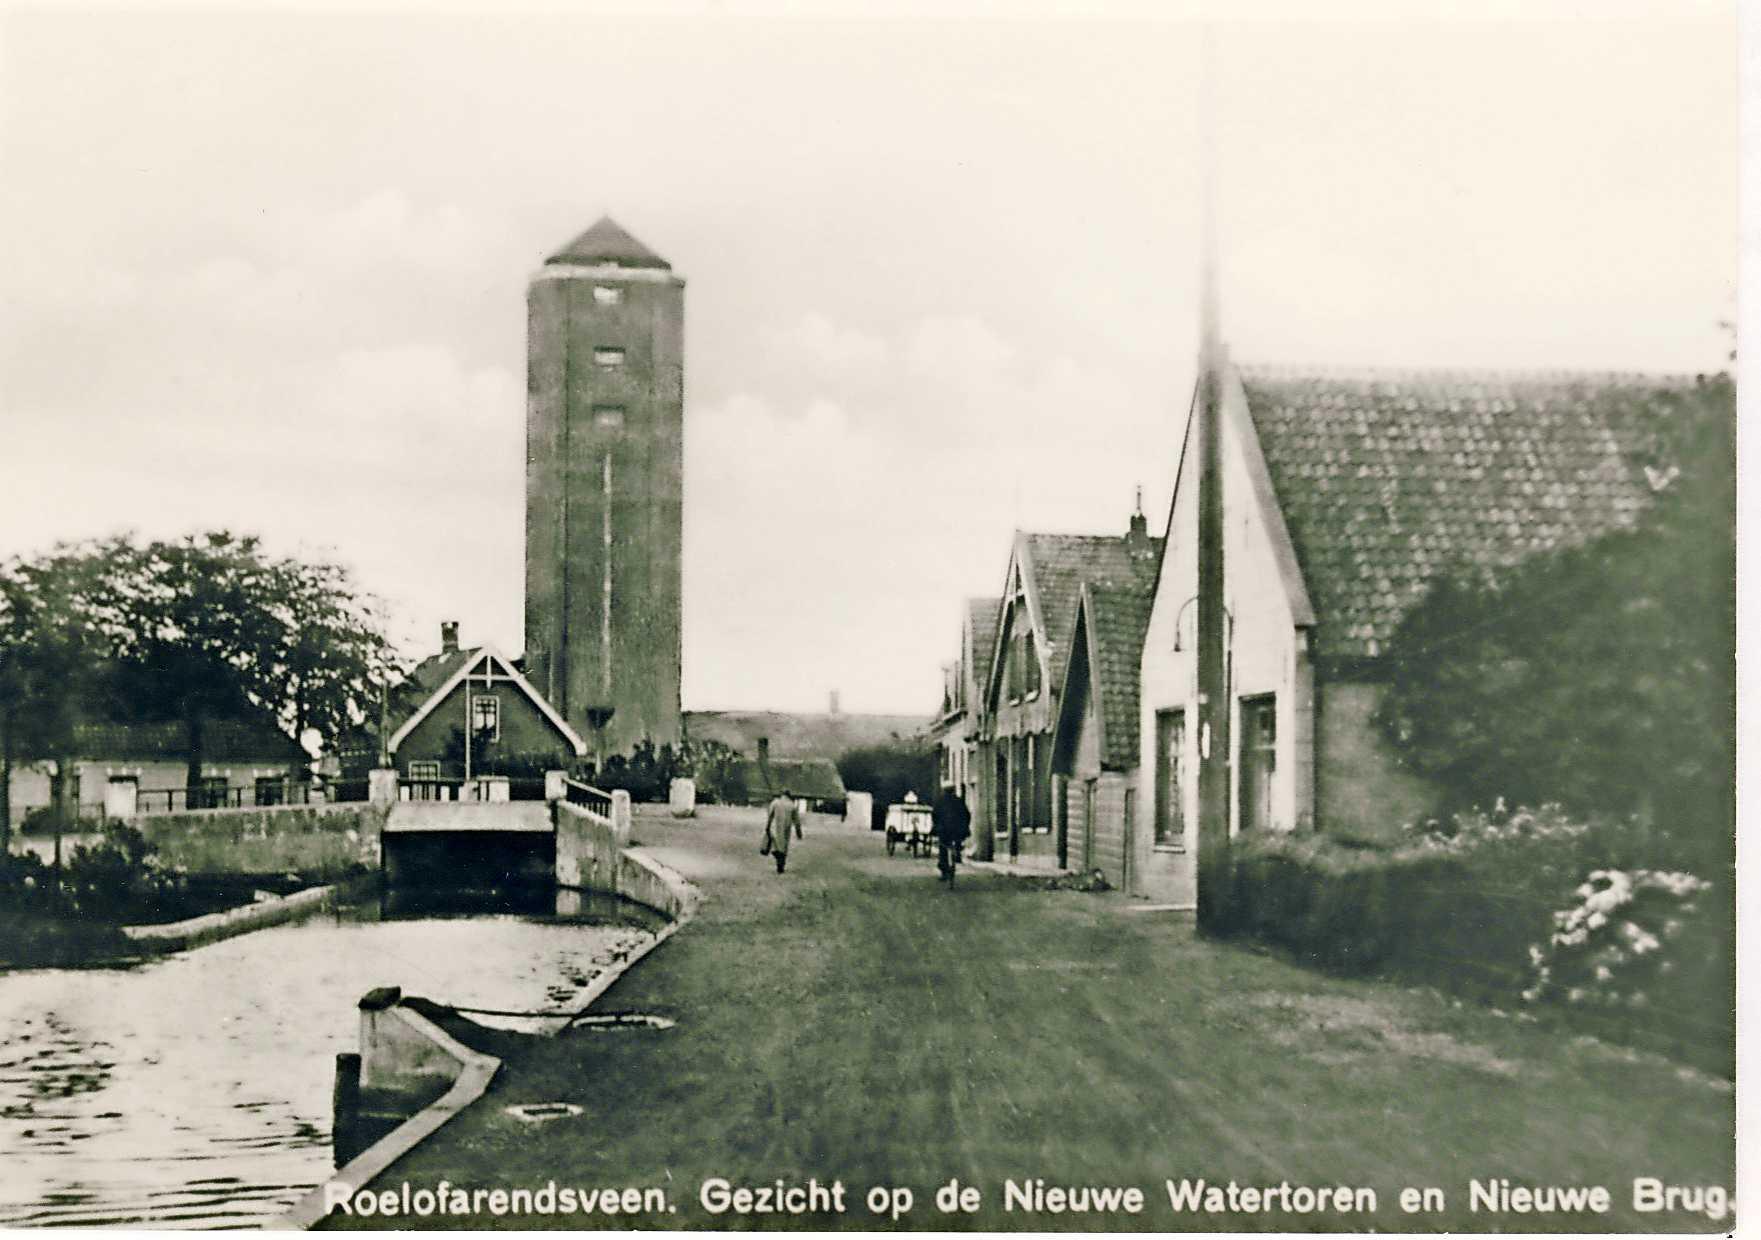 'Grootheidswaanzin van een plattelandsgemeente als Kaag en Braassem, zo'n landmark'